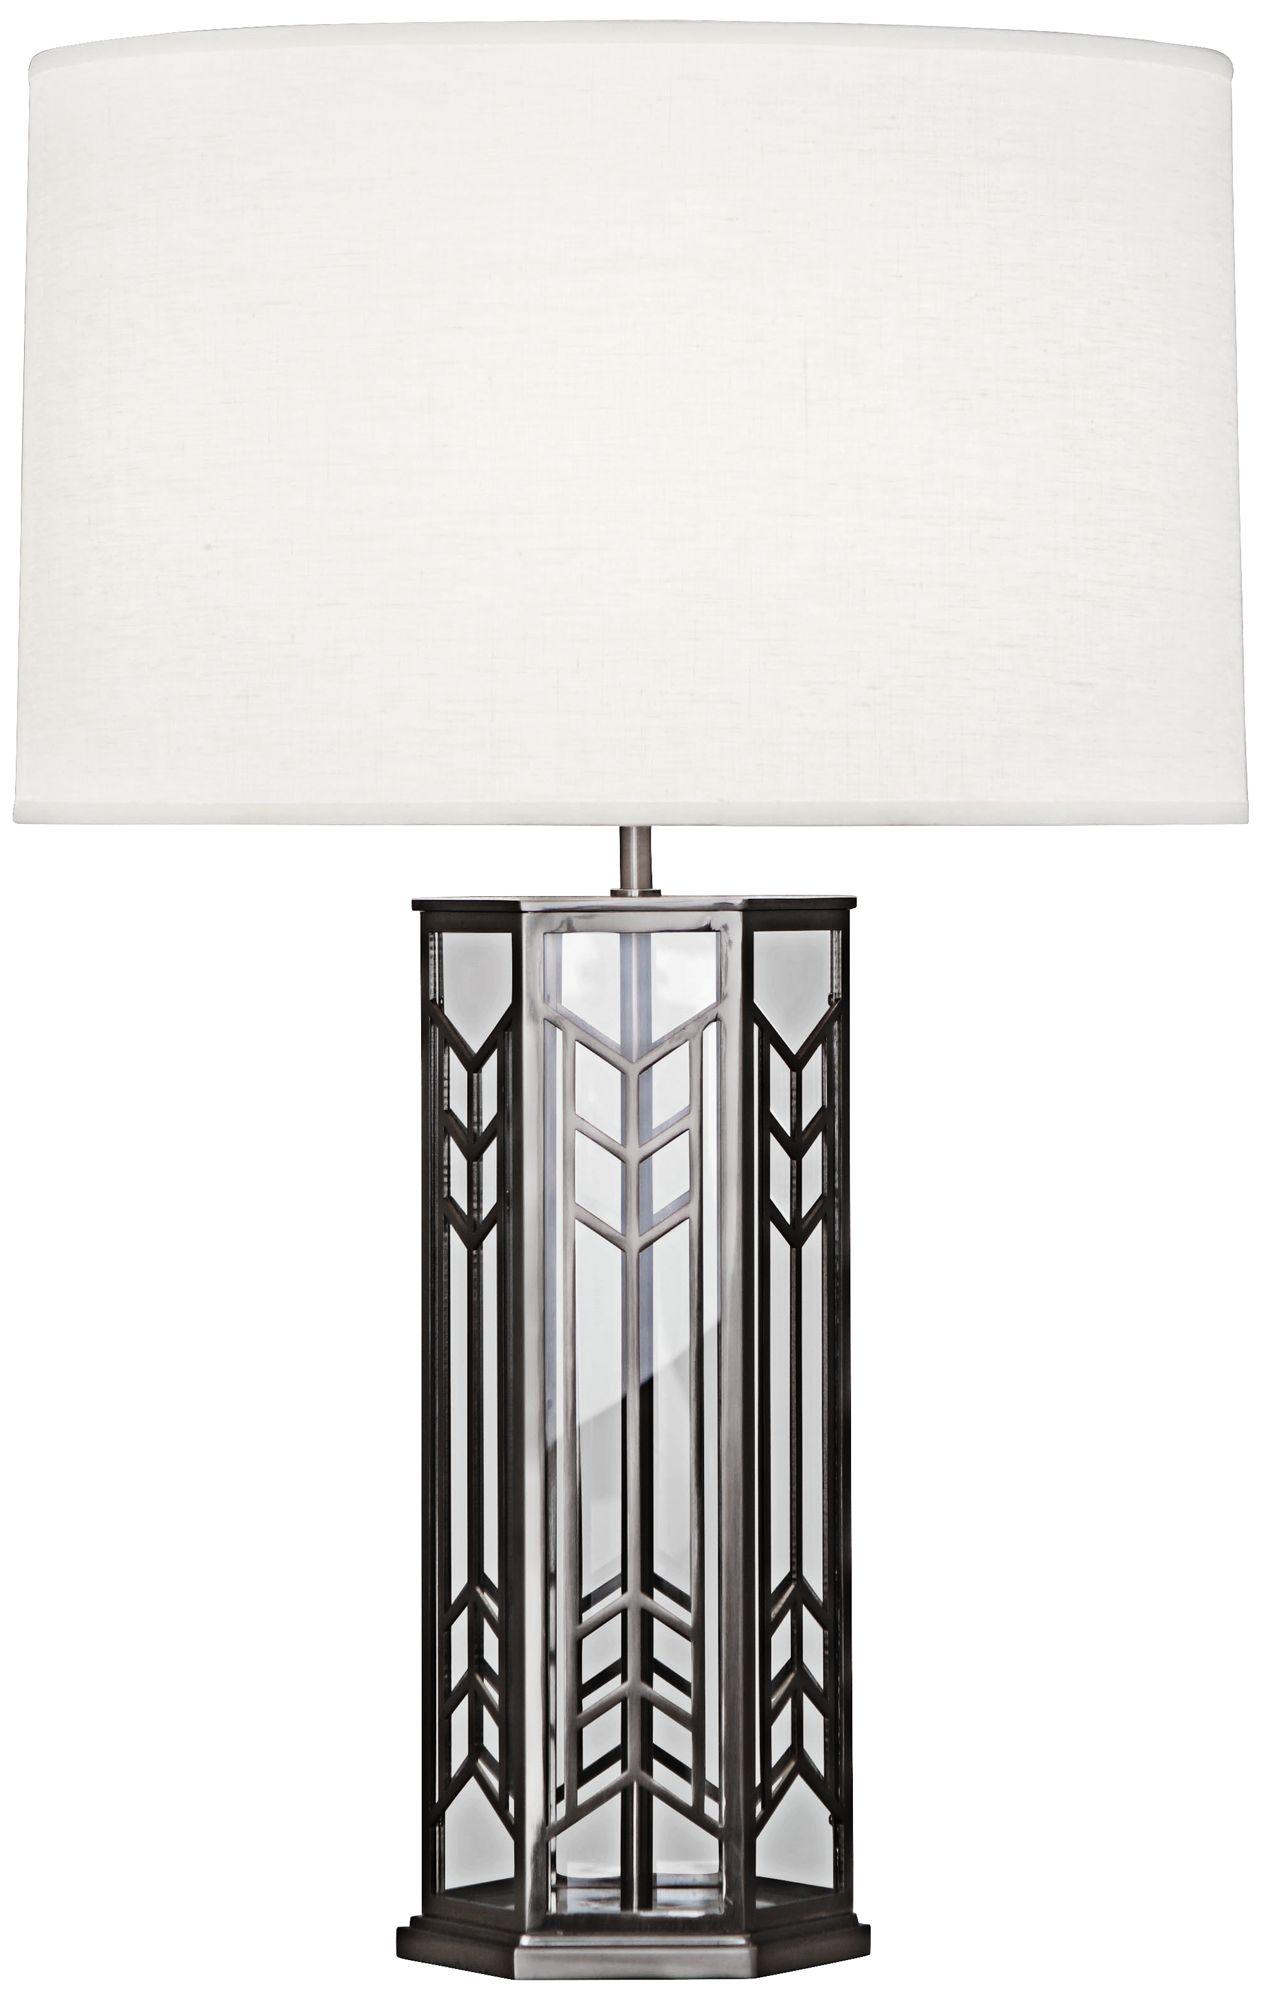 robert abbey octavius blackened nickel steel table lamp - Robert Abbey